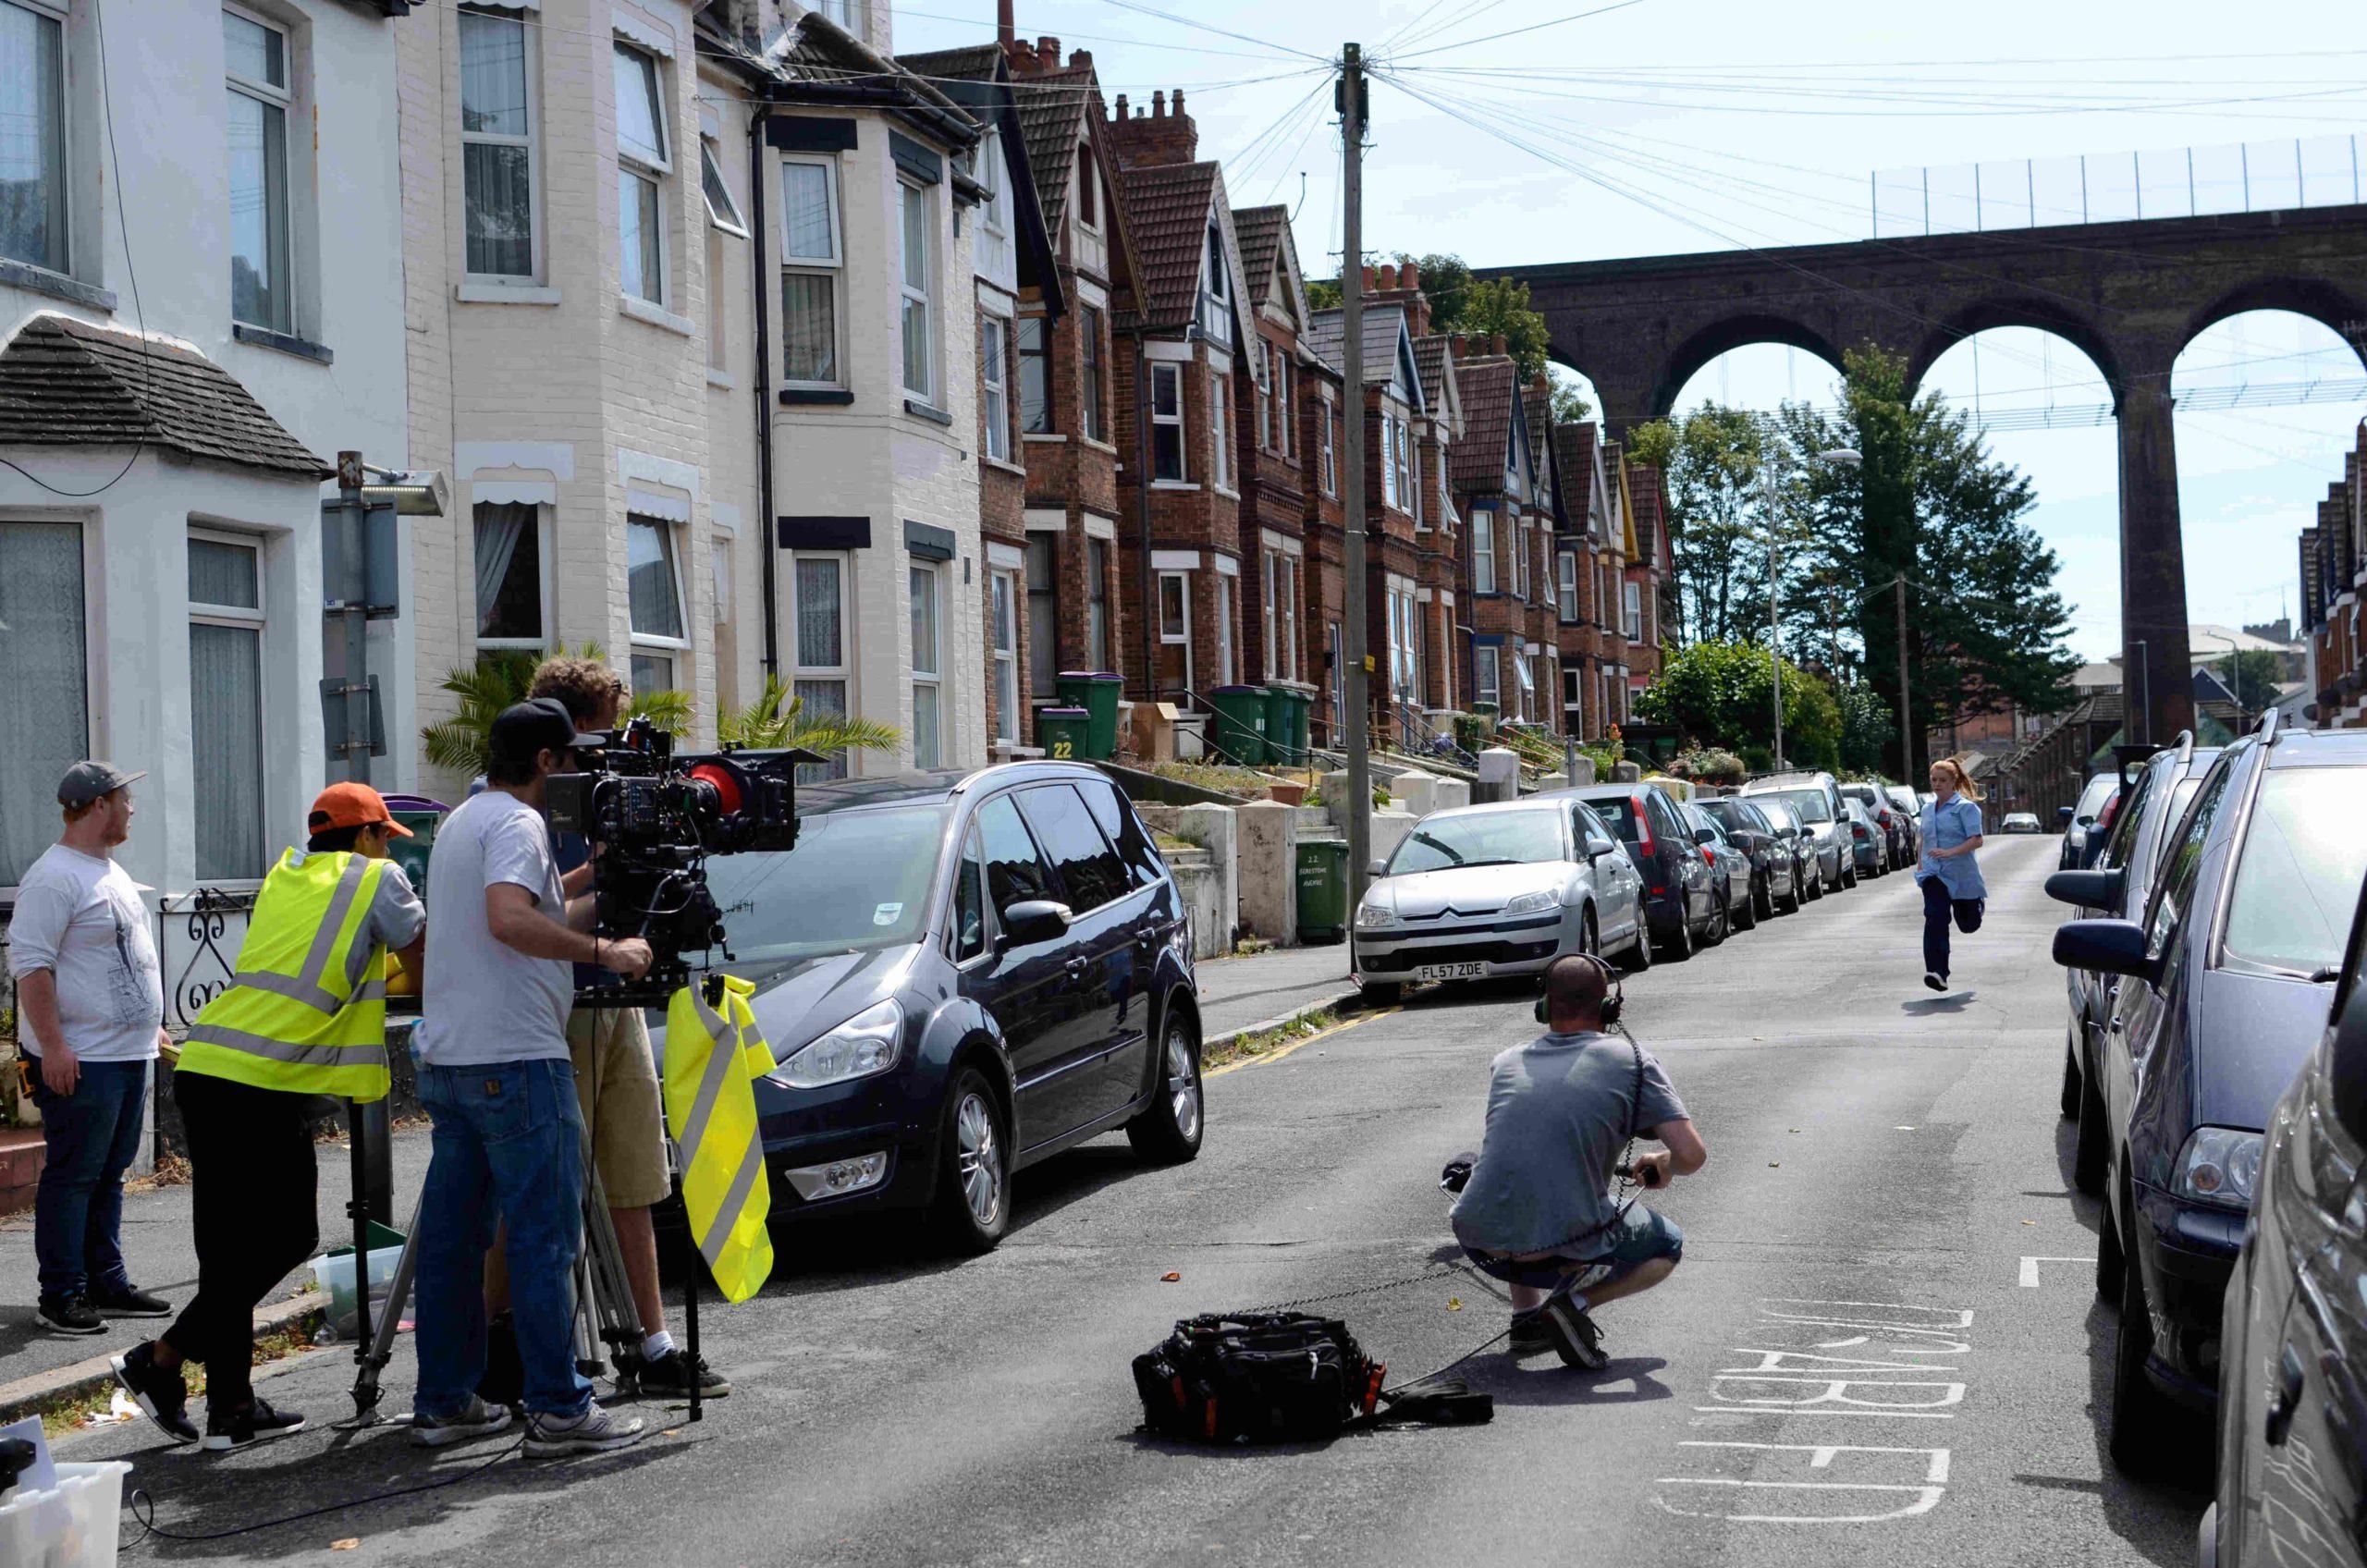 Folkestone Viaduct Run Peter Blach